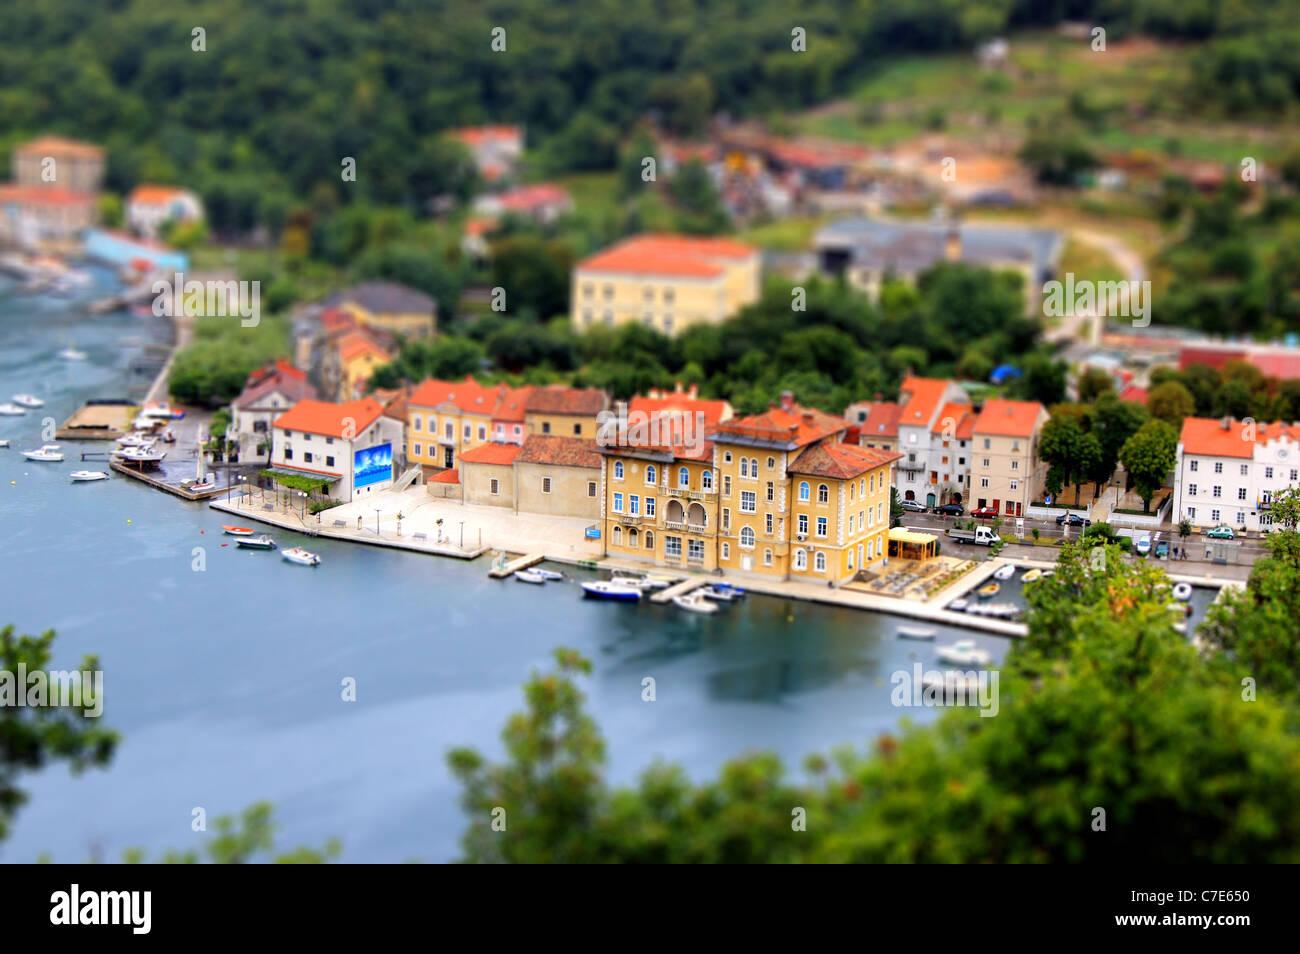 Town of Bakar miniature, tilt shif - Kvarner, Croatia - Stock Image